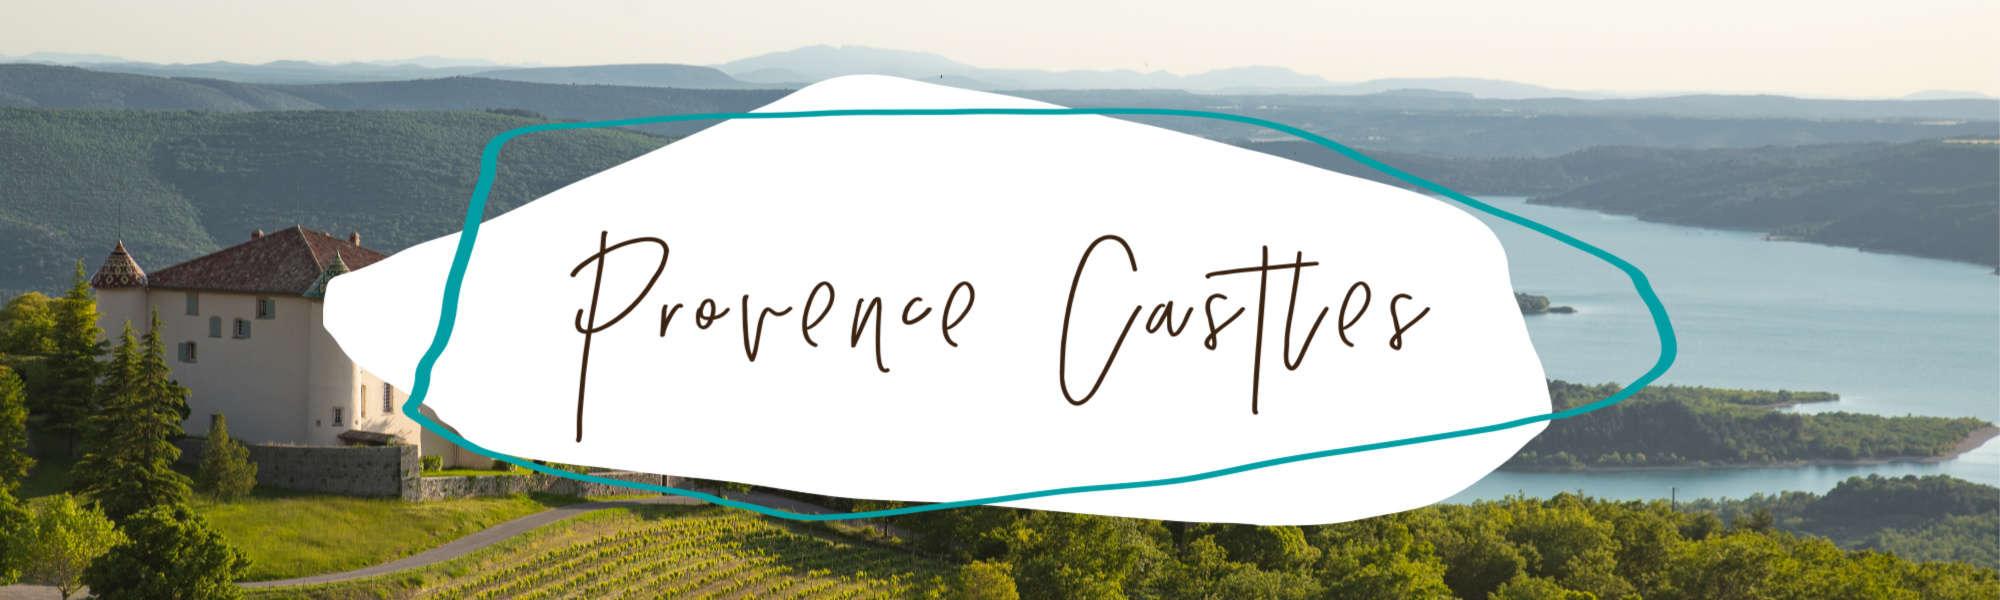 Provence Castles